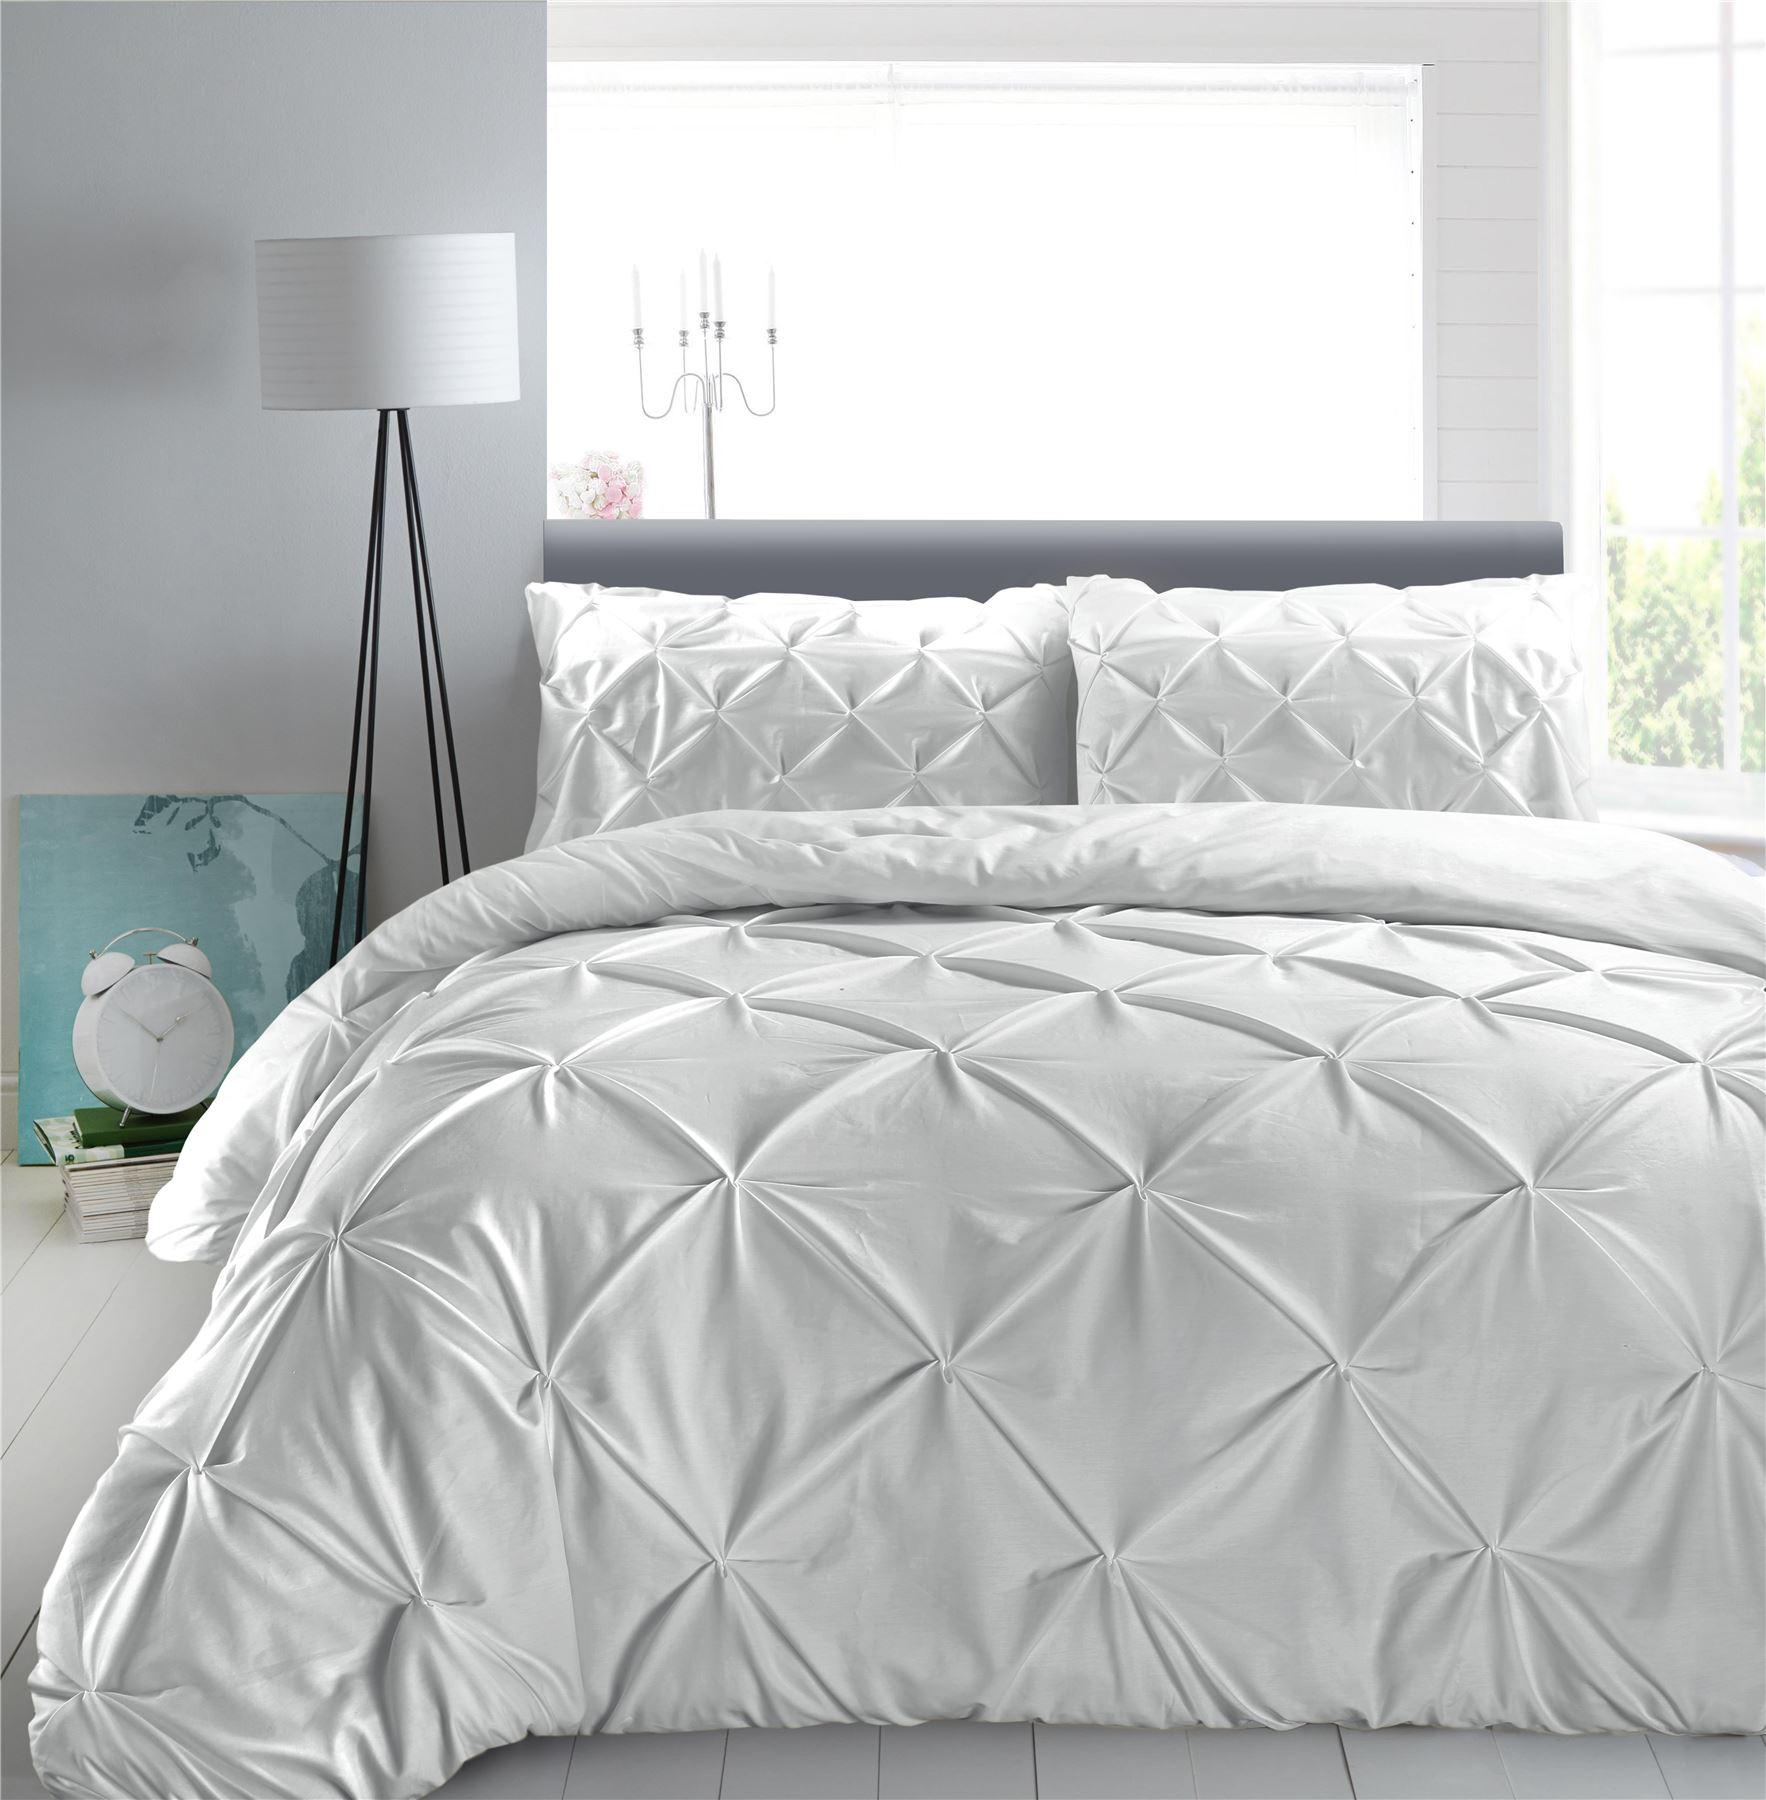 Luxury-Pure-100-Cotton-200-Thread-Pinch-Pleat-Pintuck-Puckering-Duvet-Cover-Set thumbnail 47